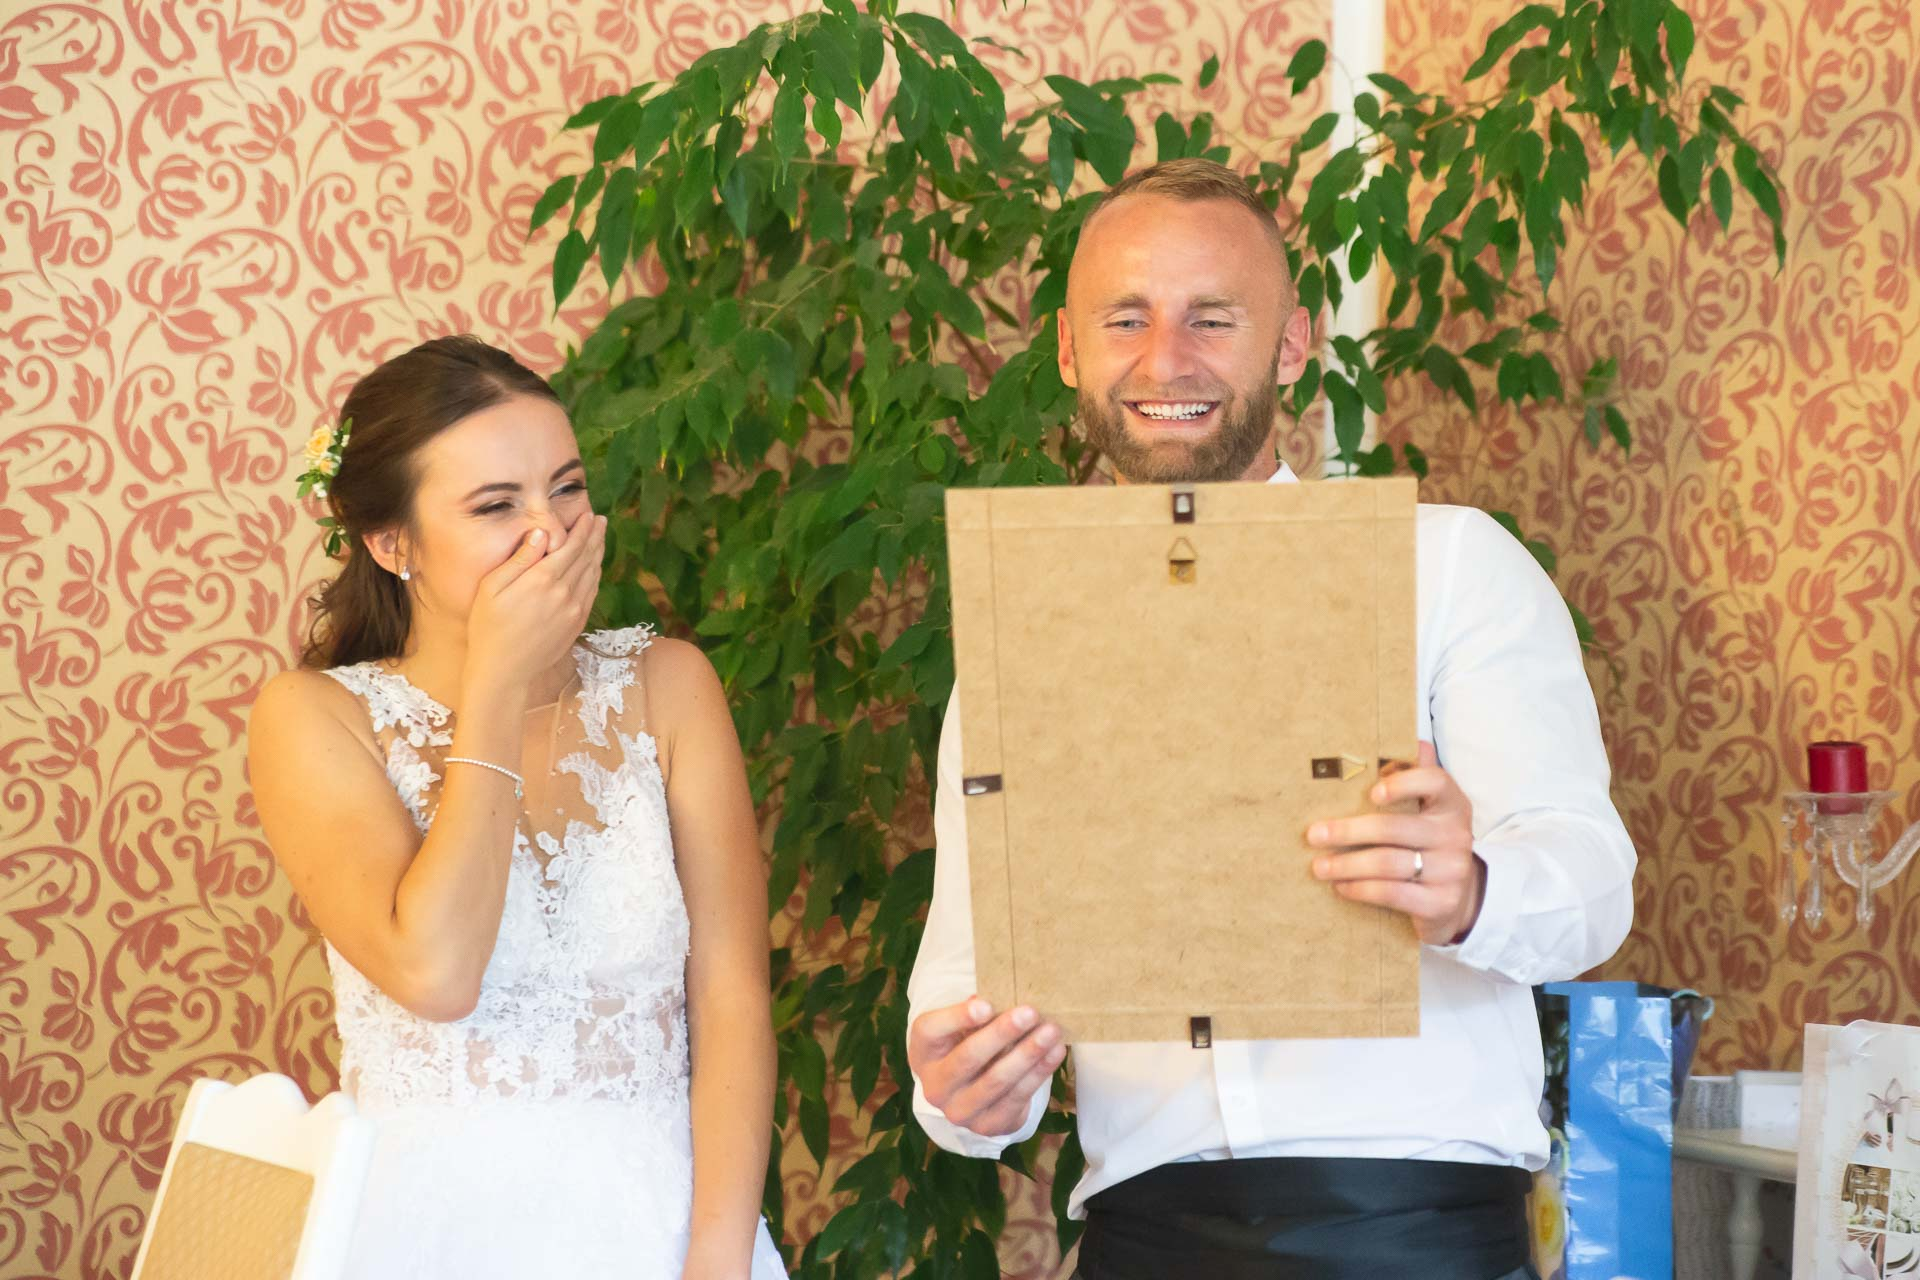 svatební-fotograf-svatebni-video-Nymburk-hotel-Ostrov-Beautyfoto-6087